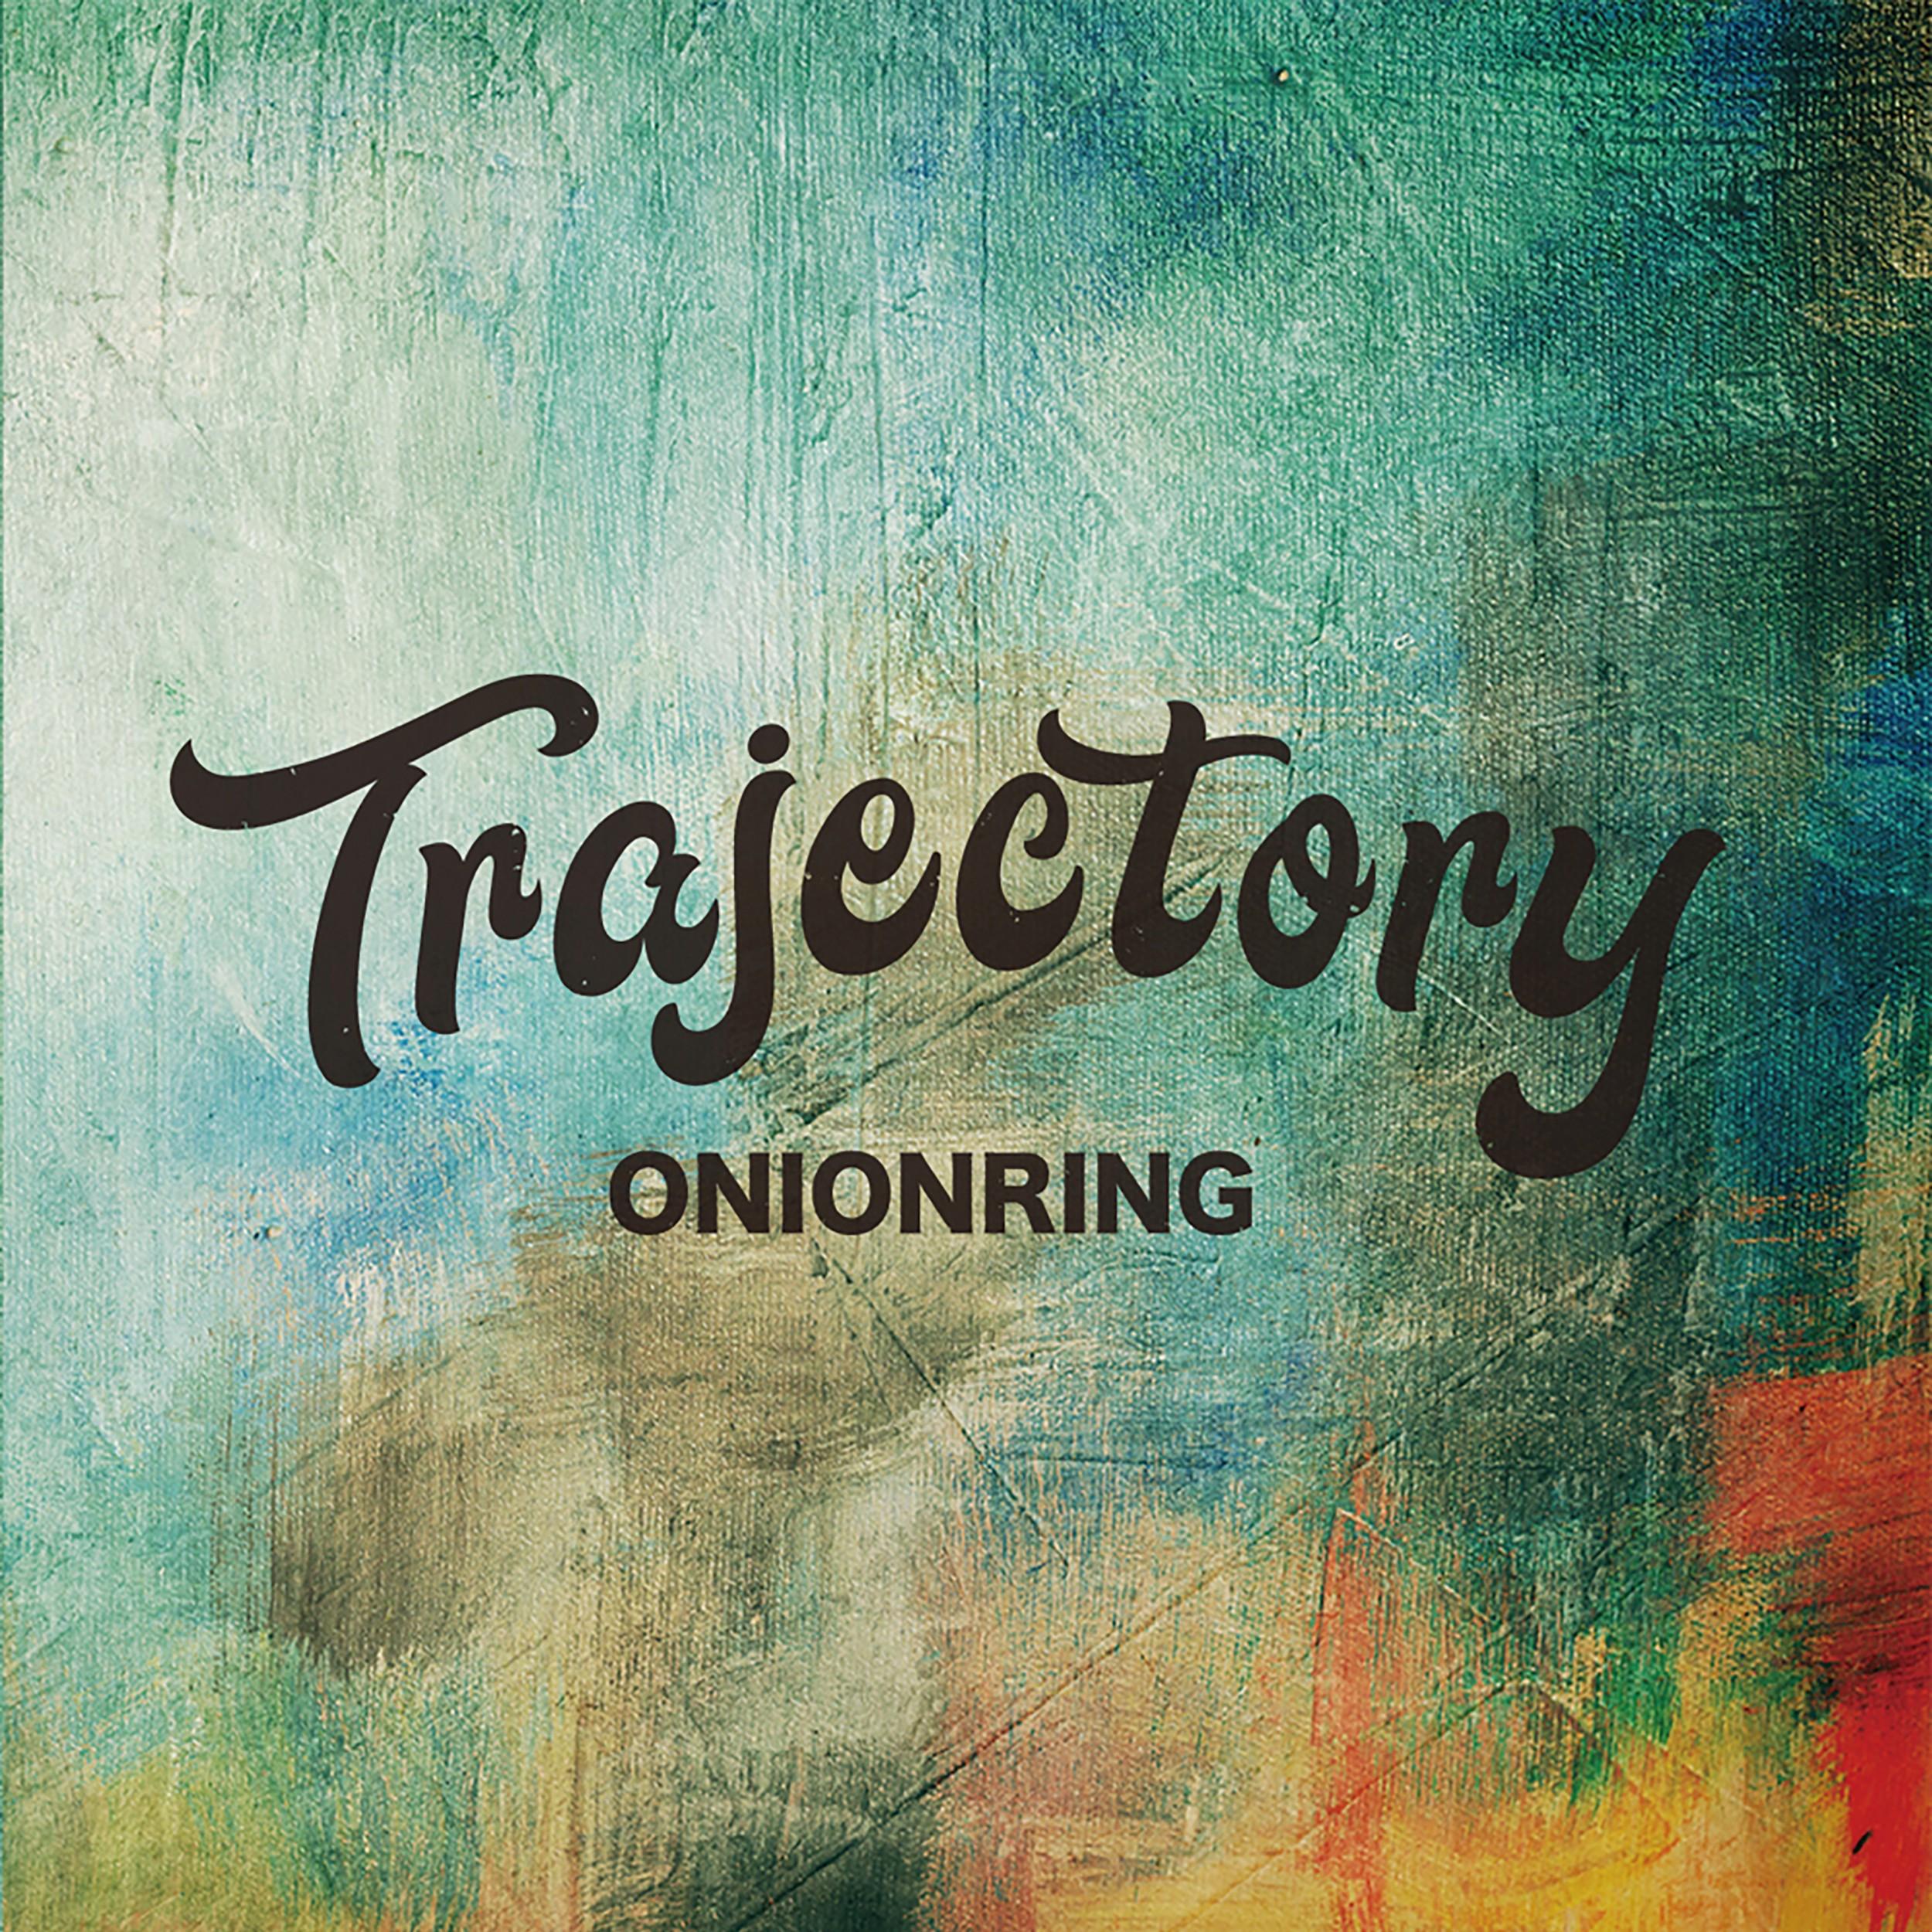 Image of Trajectory / ONIONRING